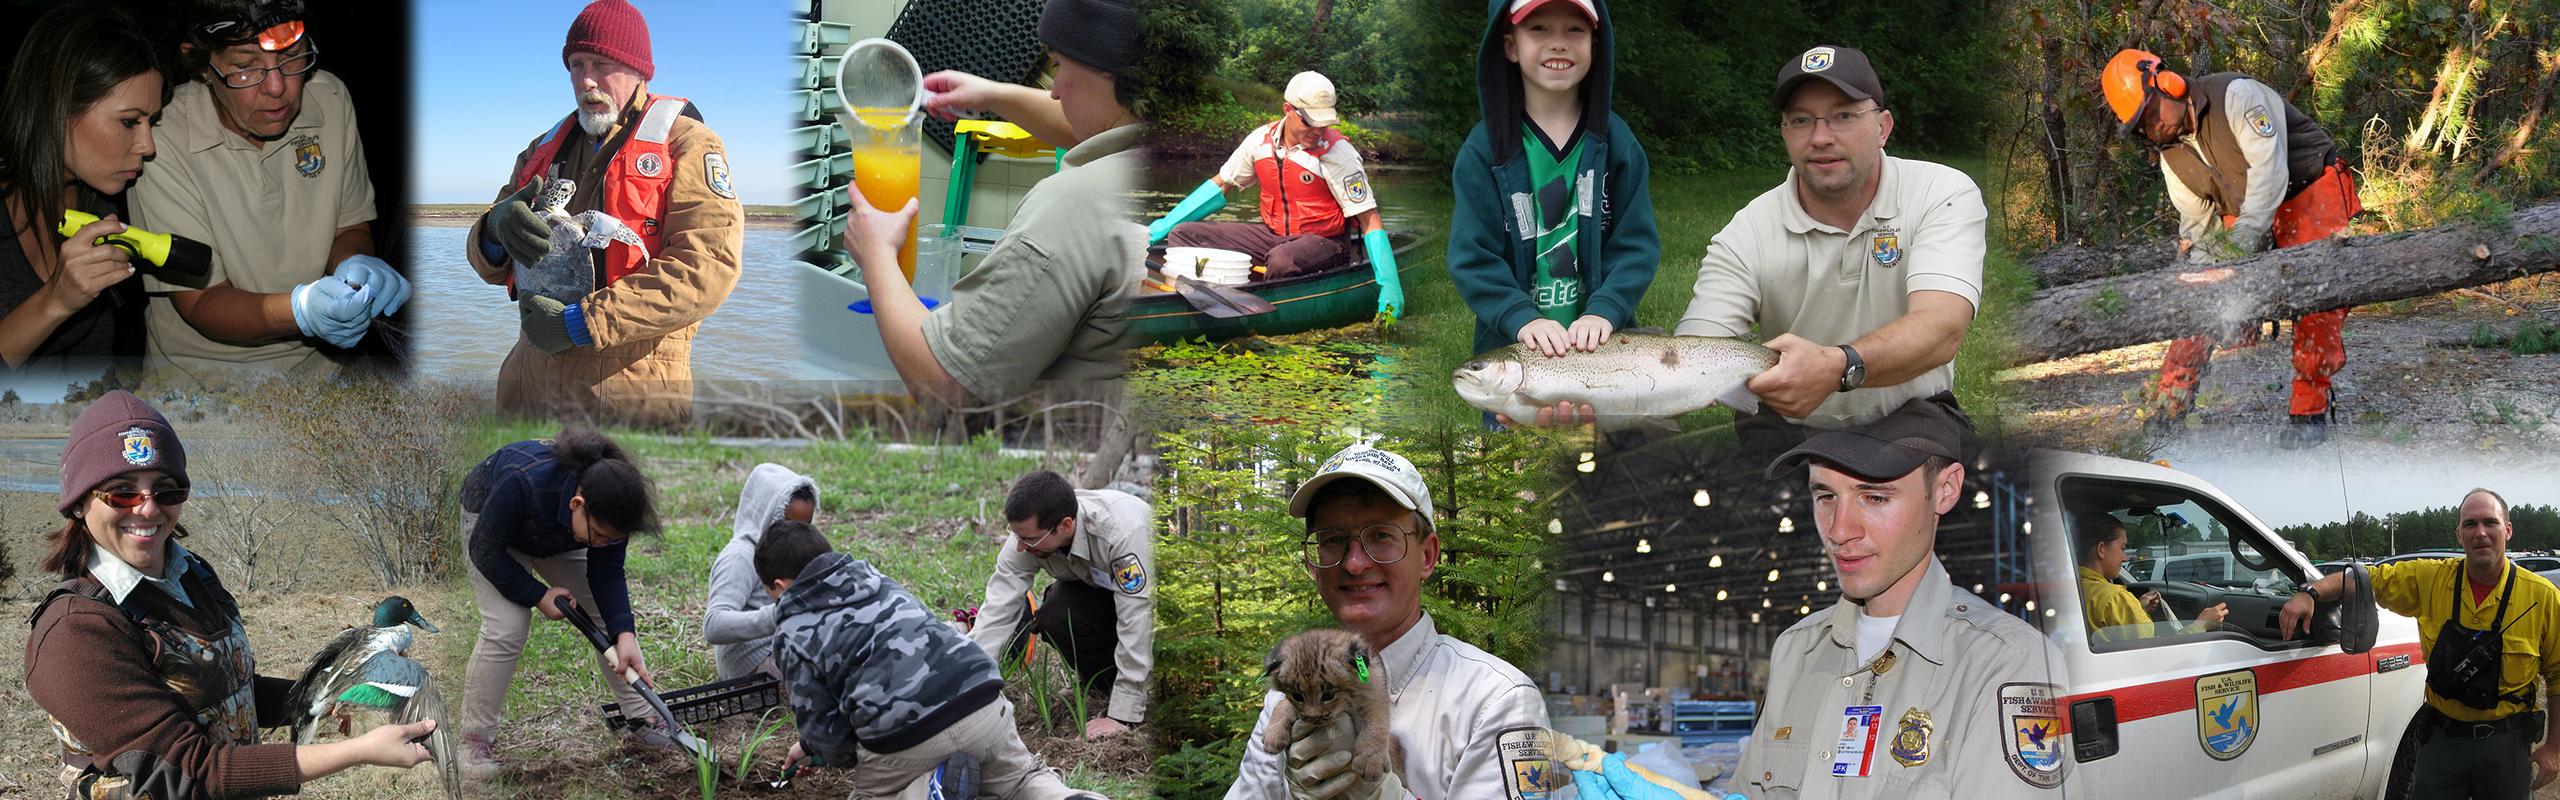 U.S. Fish and Wildlife Service Northeast Region